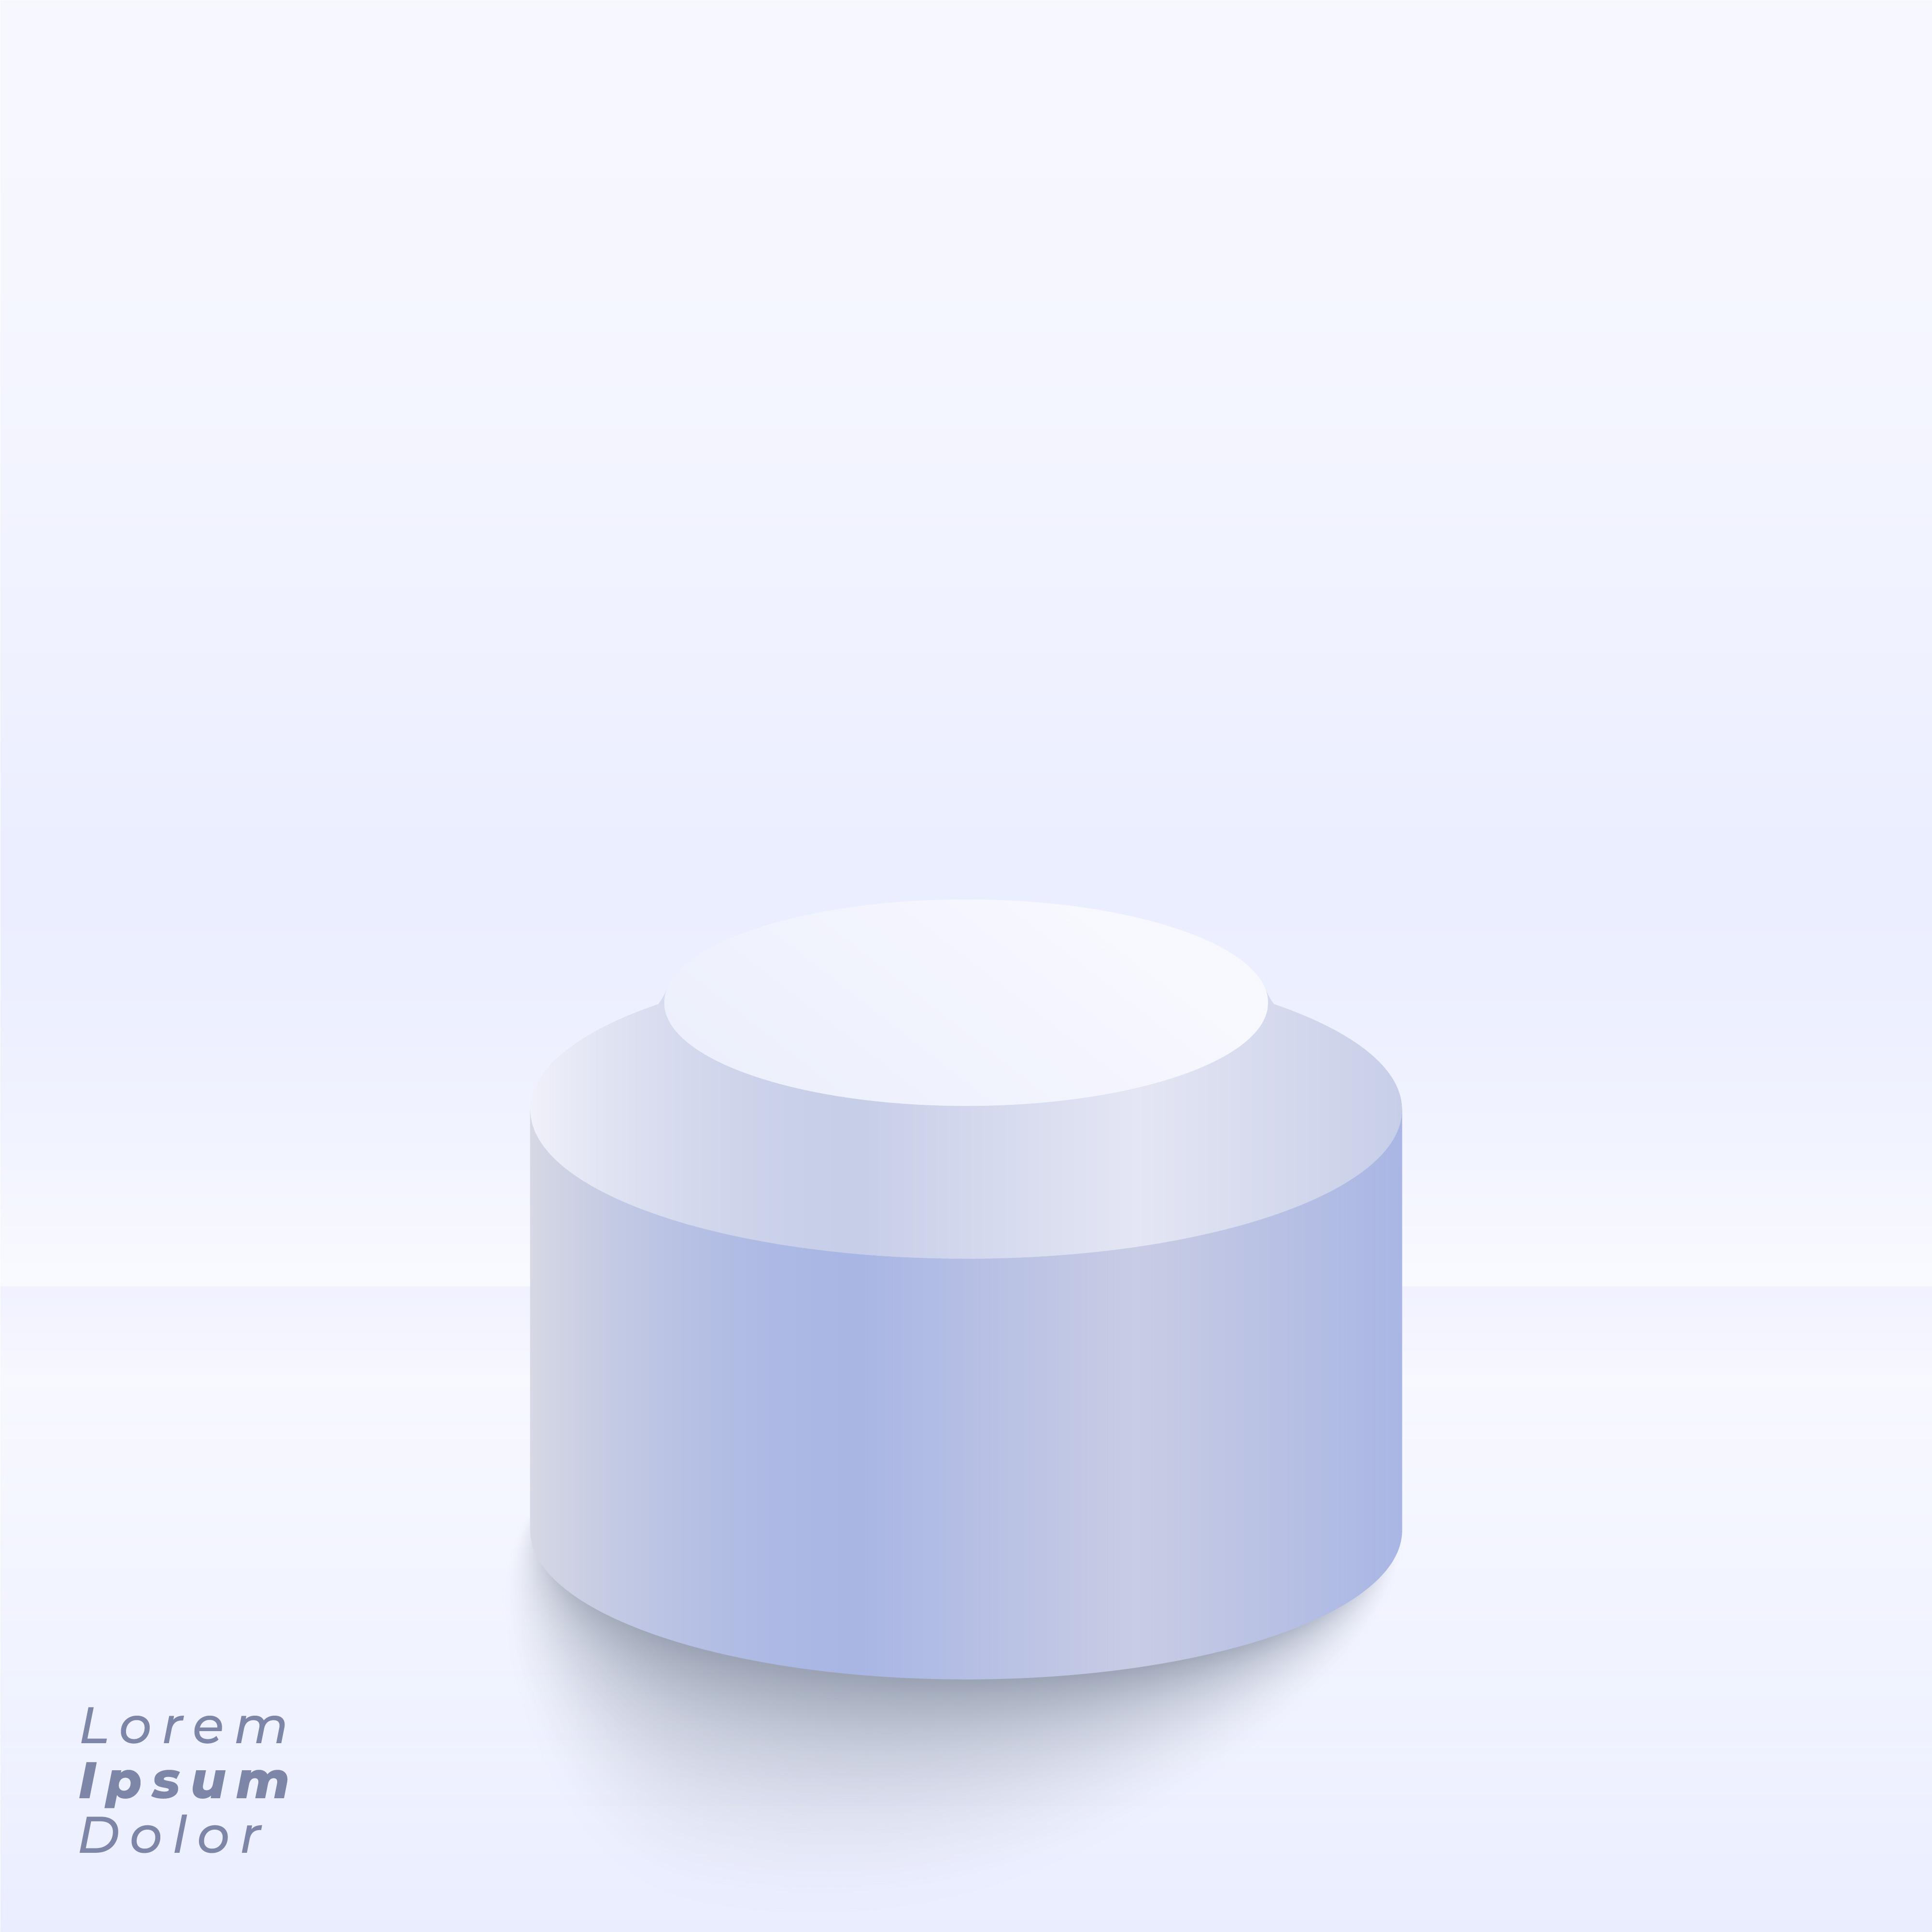 White Studio Background With Podium: Studio Stage Background With 3d Podium For Presentation